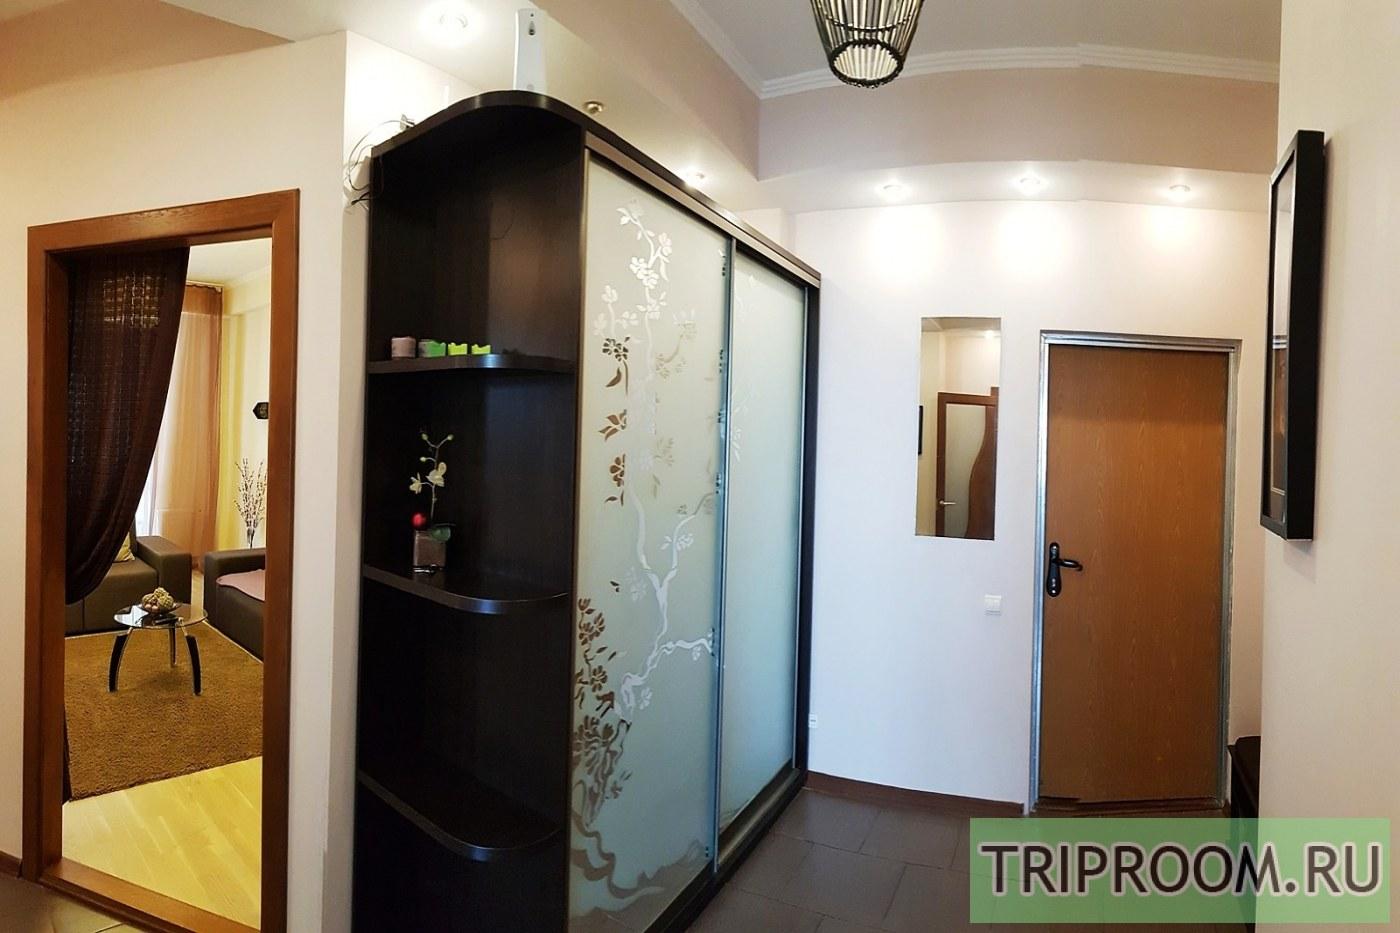 2-комнатная квартира посуточно (вариант № 657), ул. Дыбенко улица, фото № 13